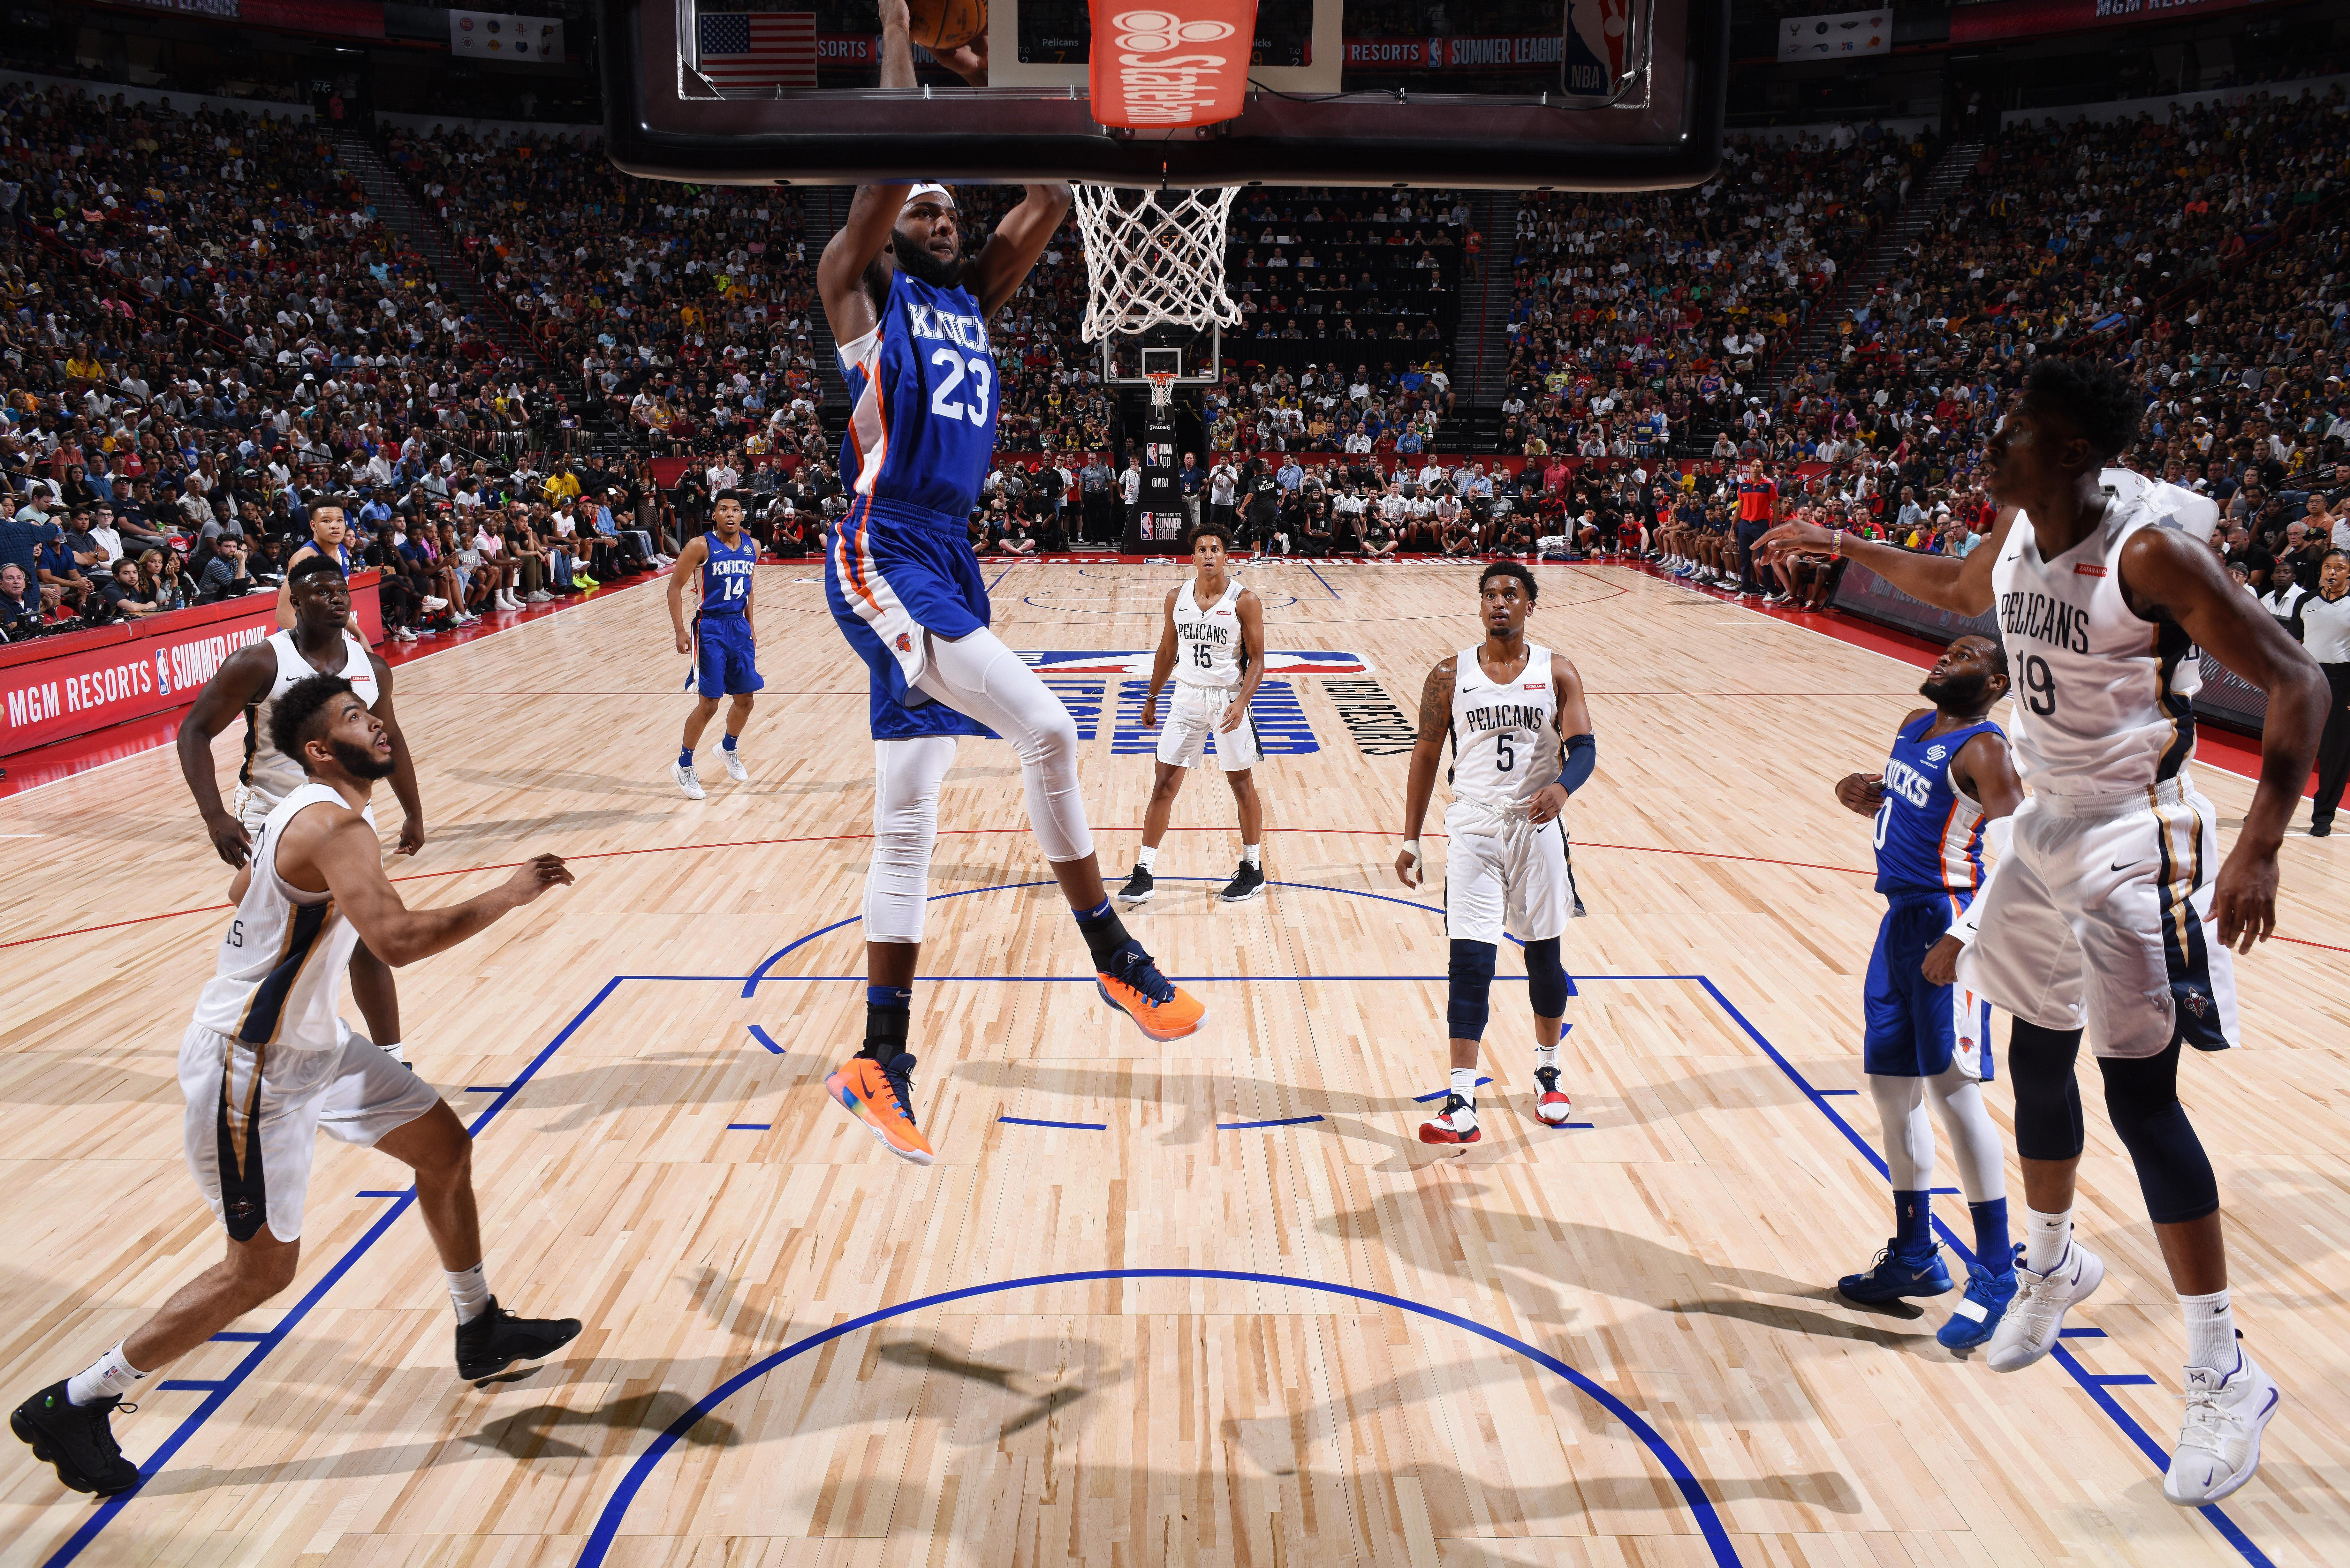 2019 Las Vegas Summer League - Day 1 - New York Knicks v New Orleans Pelicans